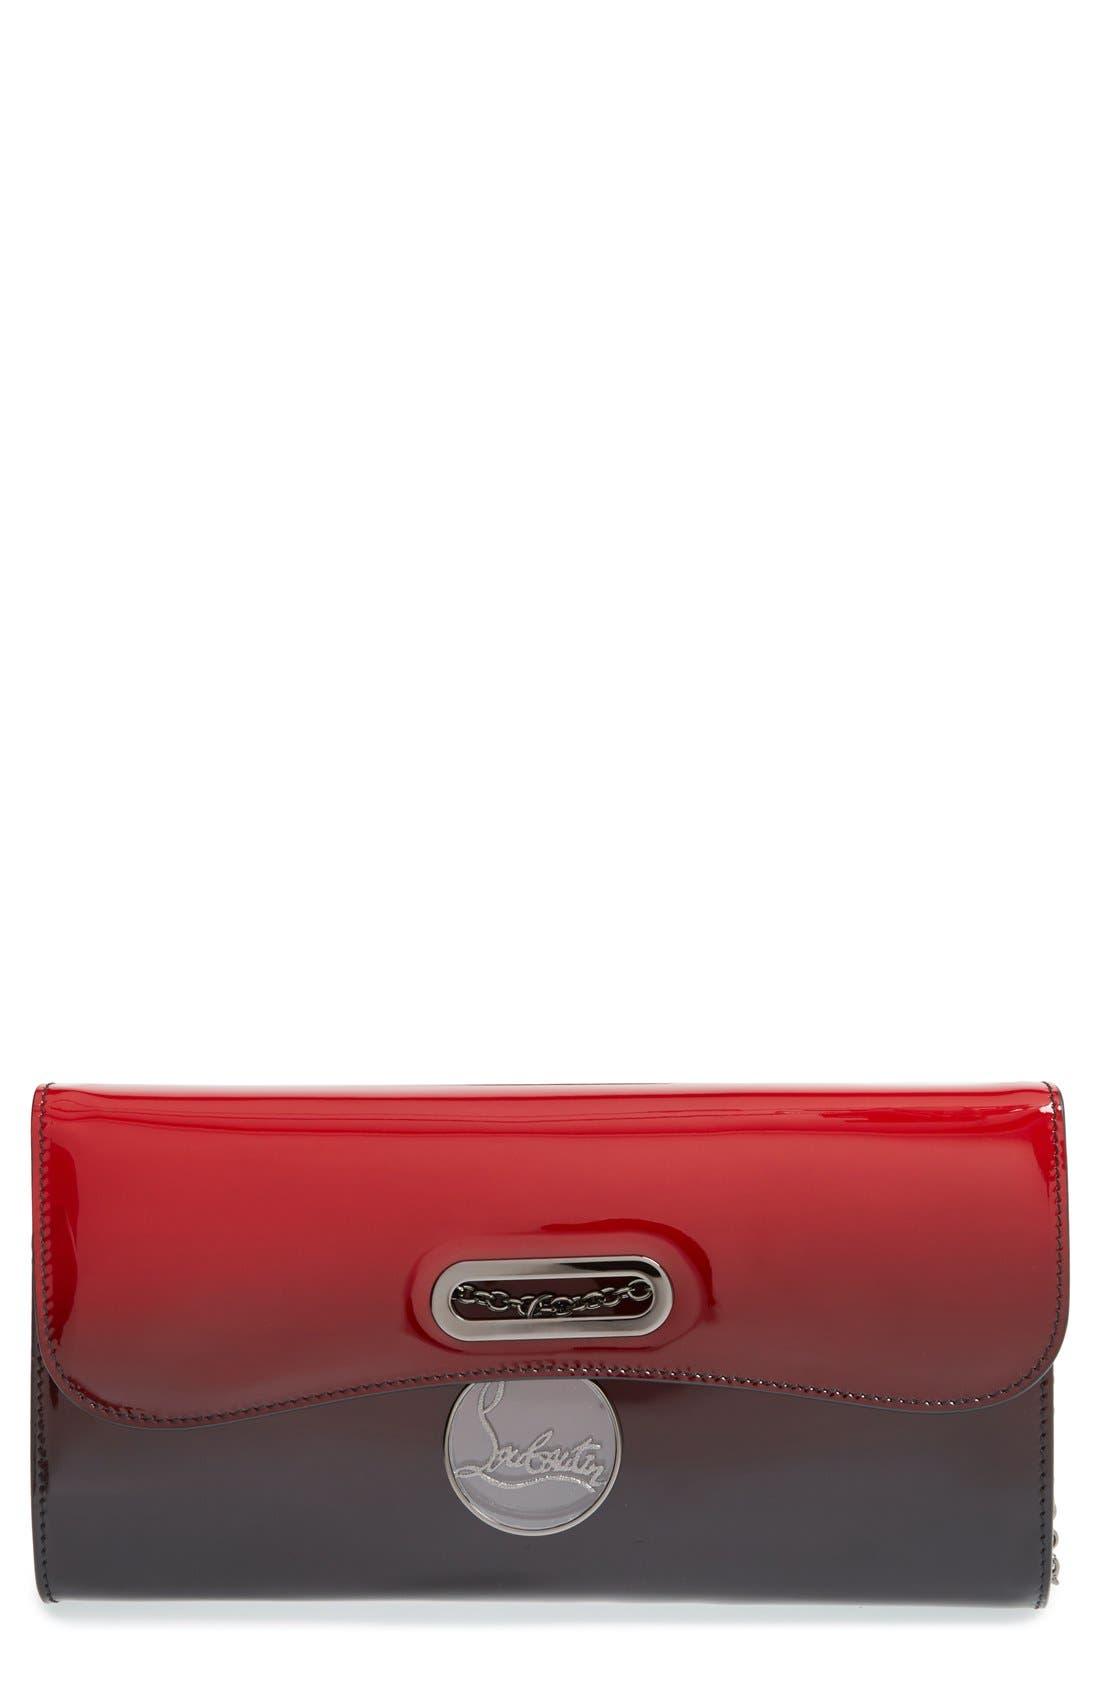 Alternate Image 1 Selected - Christian Louboutin 'Riviera' Dégradé Patent Leather Clutch